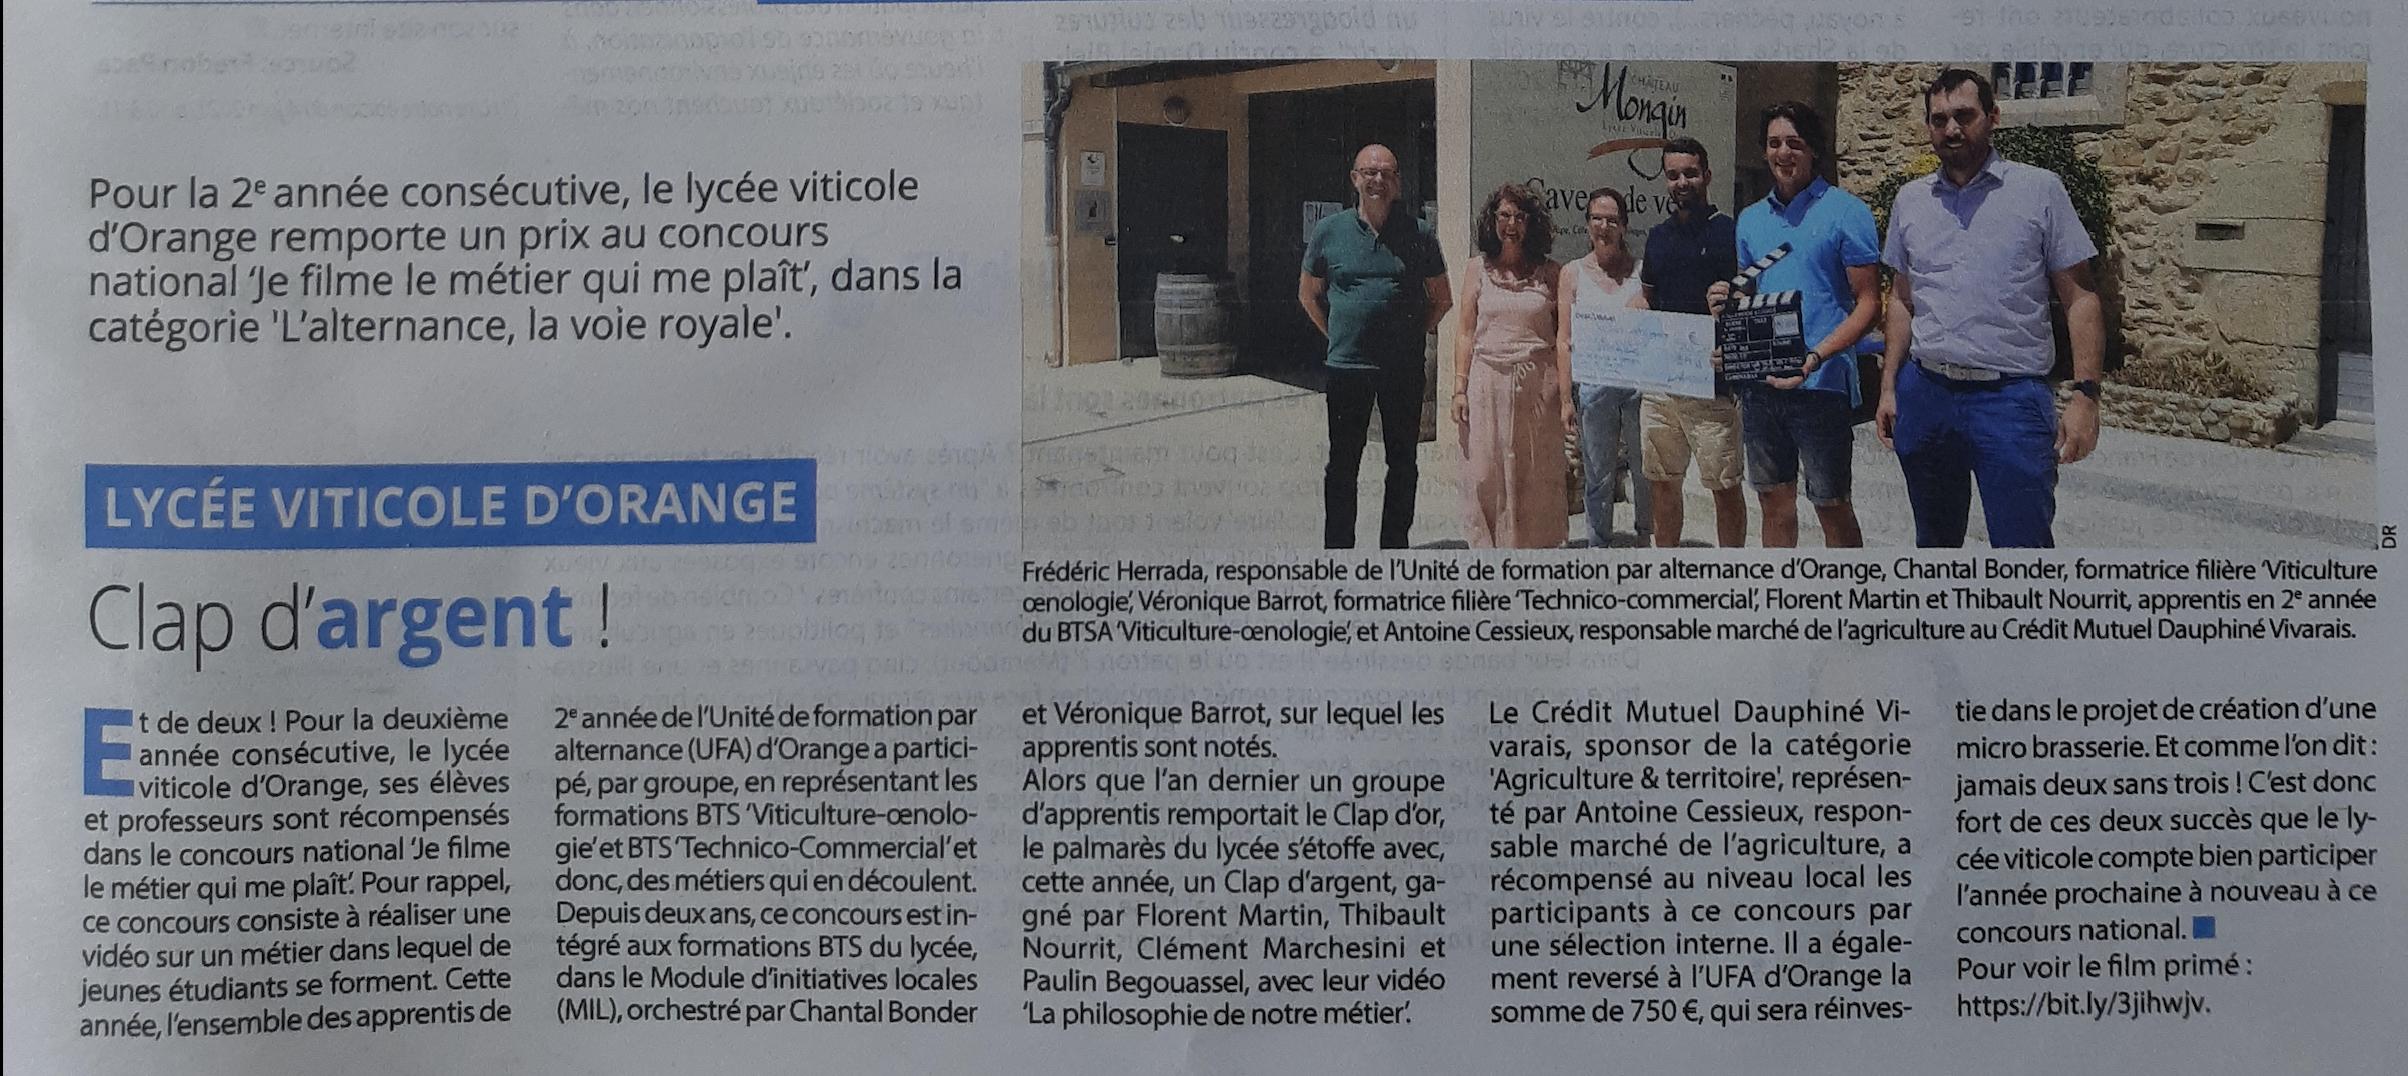 Vaucluse Agricole - 02/07/2021